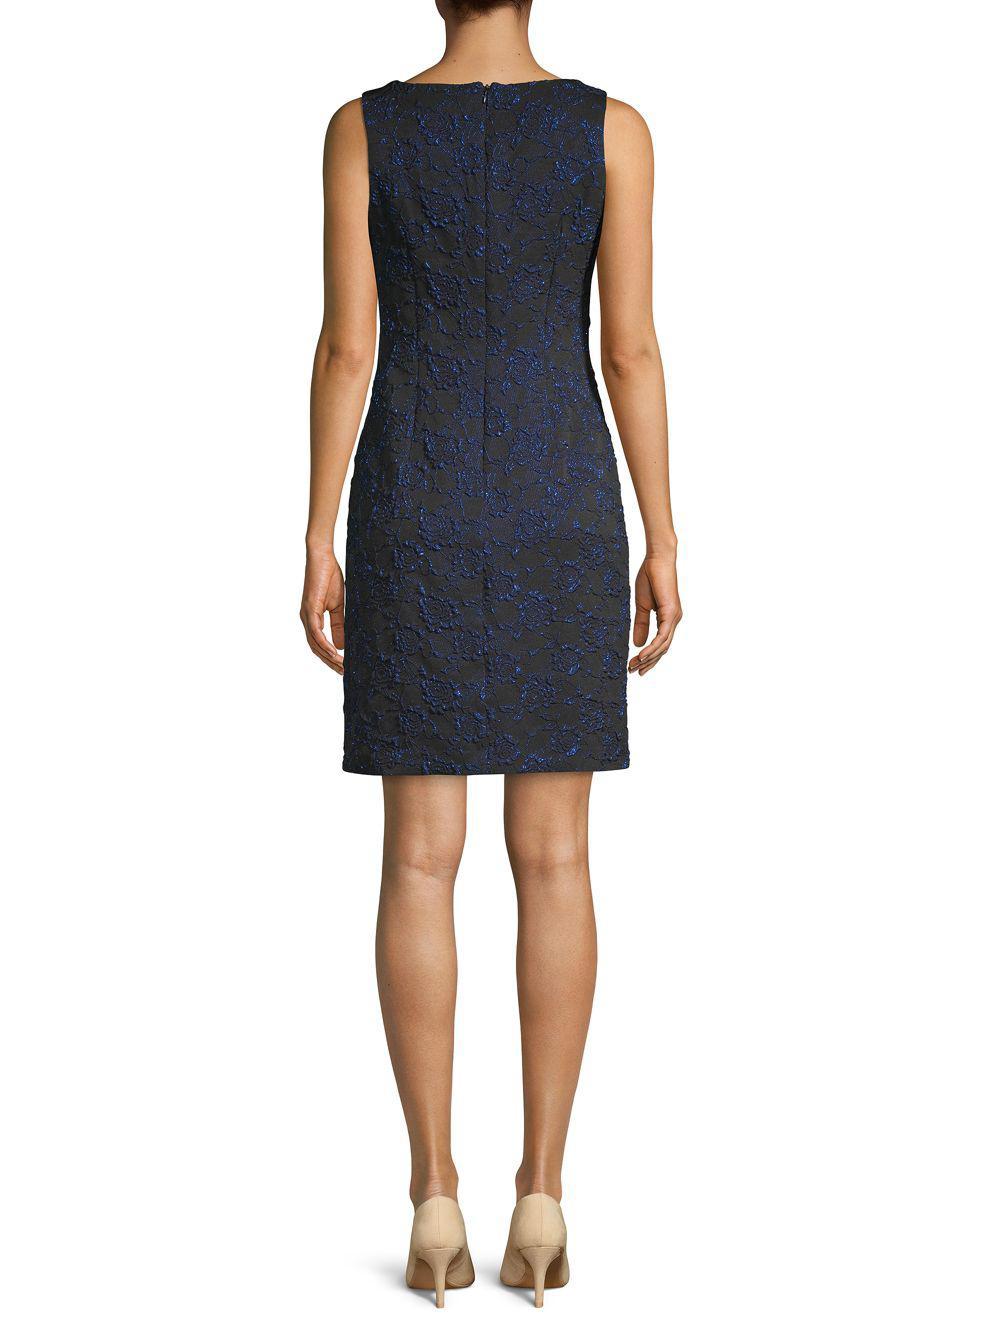 55a8b52151ea1 Donna Ricco - Black Embroidered Two-tone Sheath Dress - Lyst. View  fullscreen